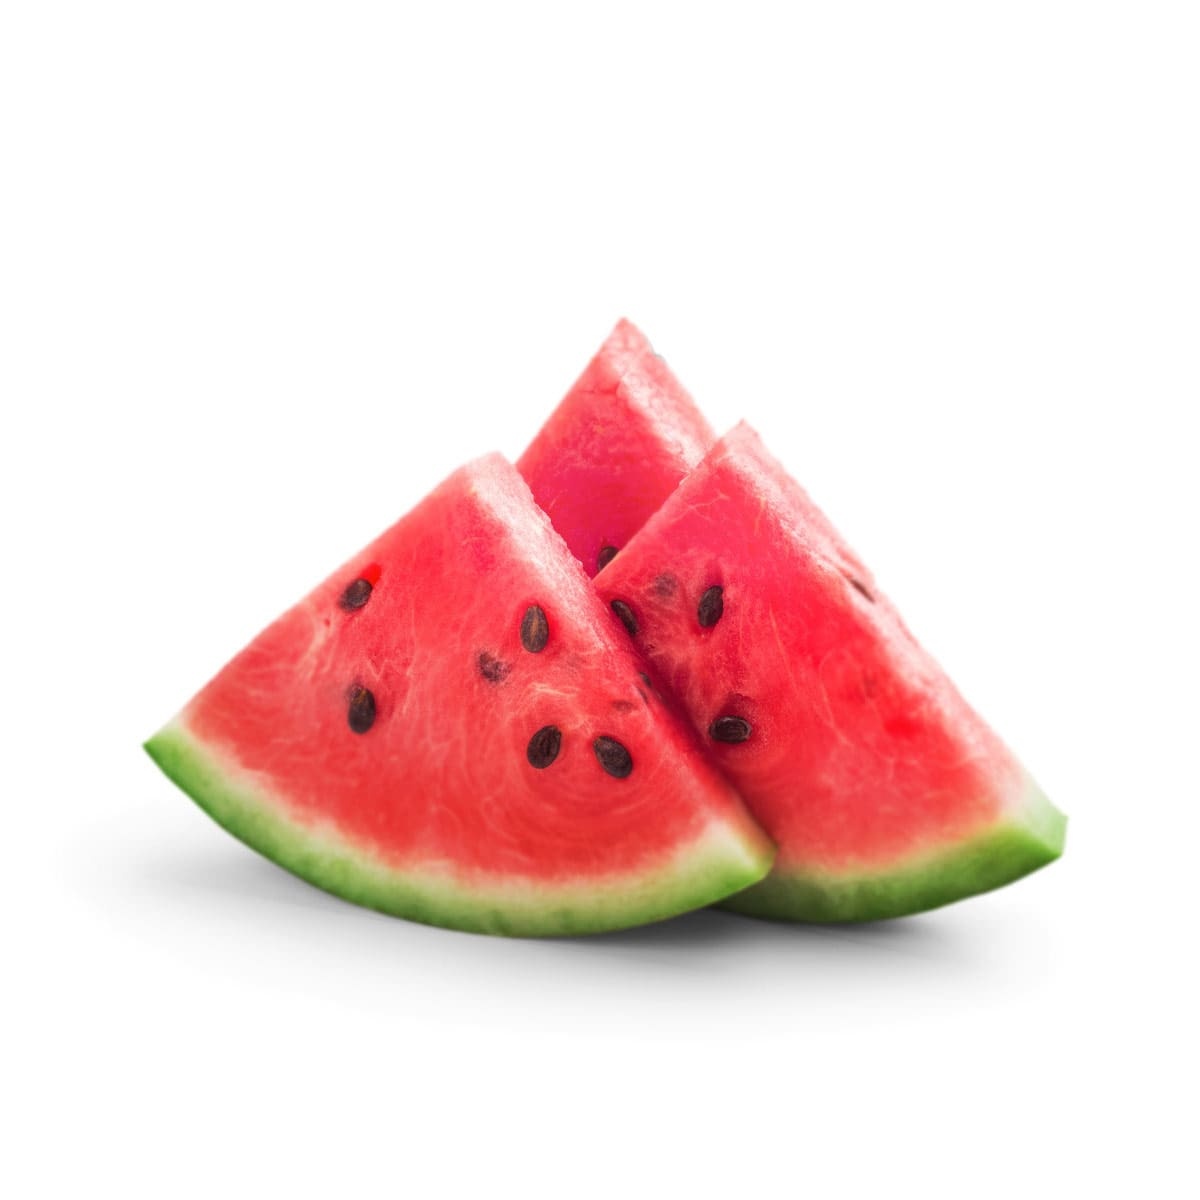 watermelon-centered-min